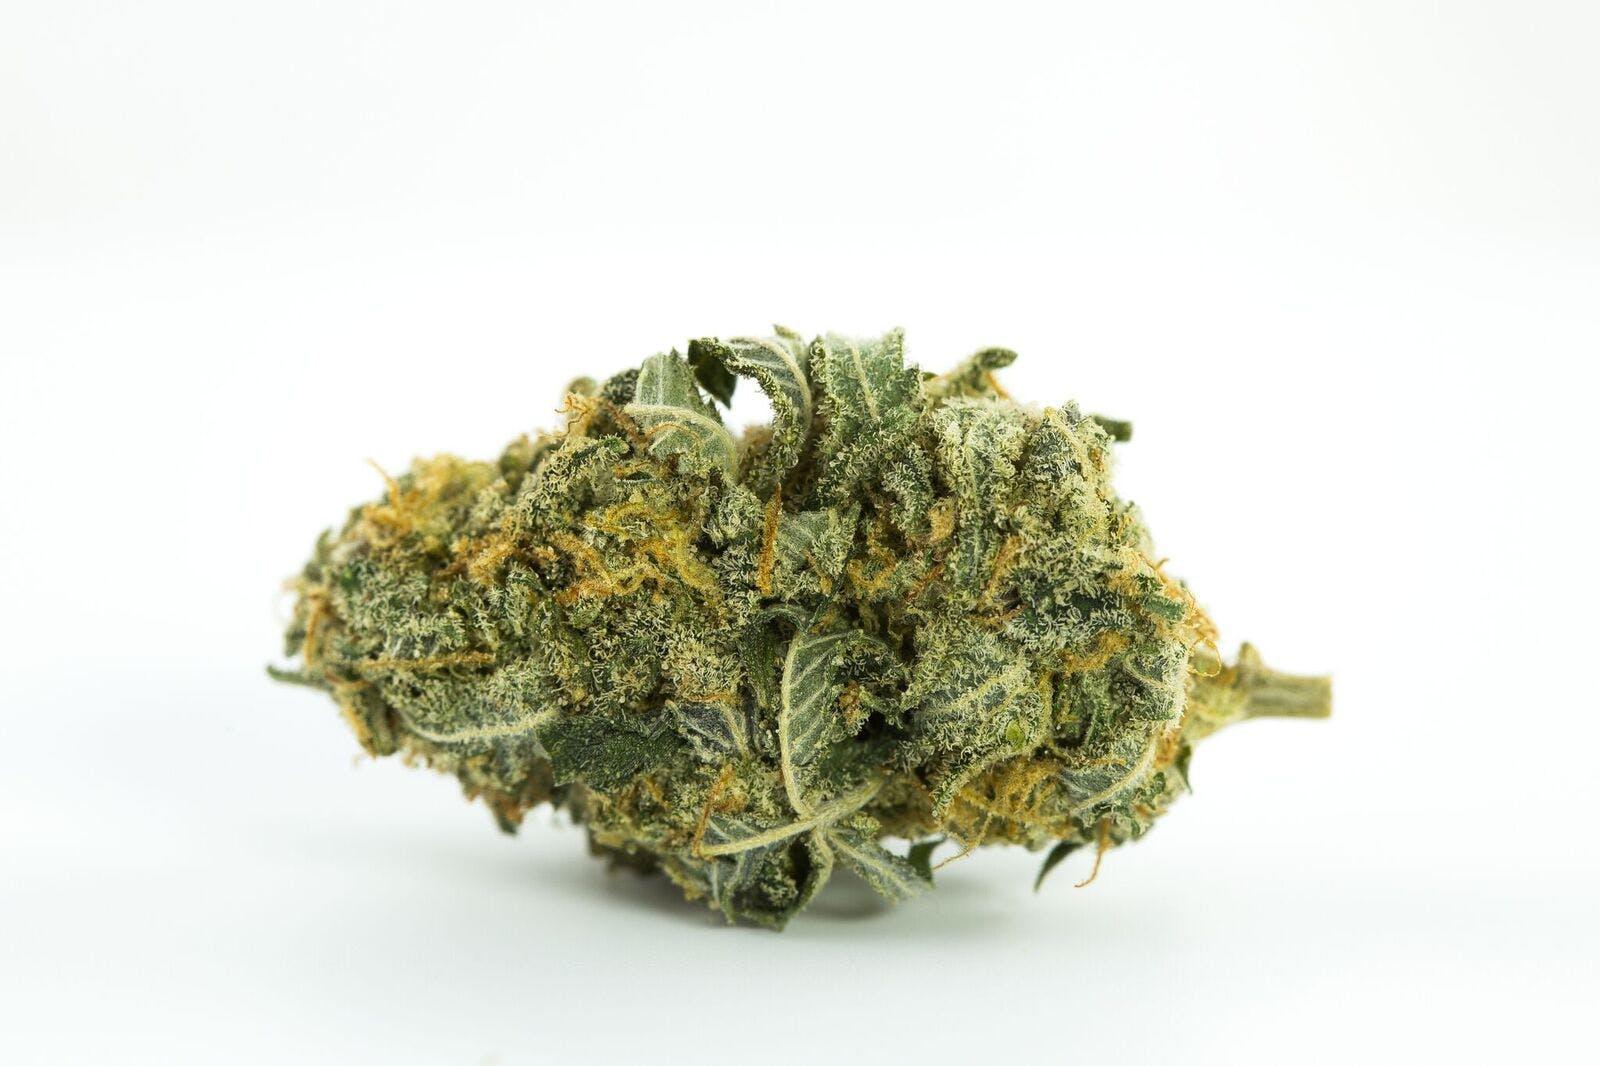 Bay 11 Weed; Bay 11 Cannabis Strain; Bay 11 Sativa Marijuana Strain